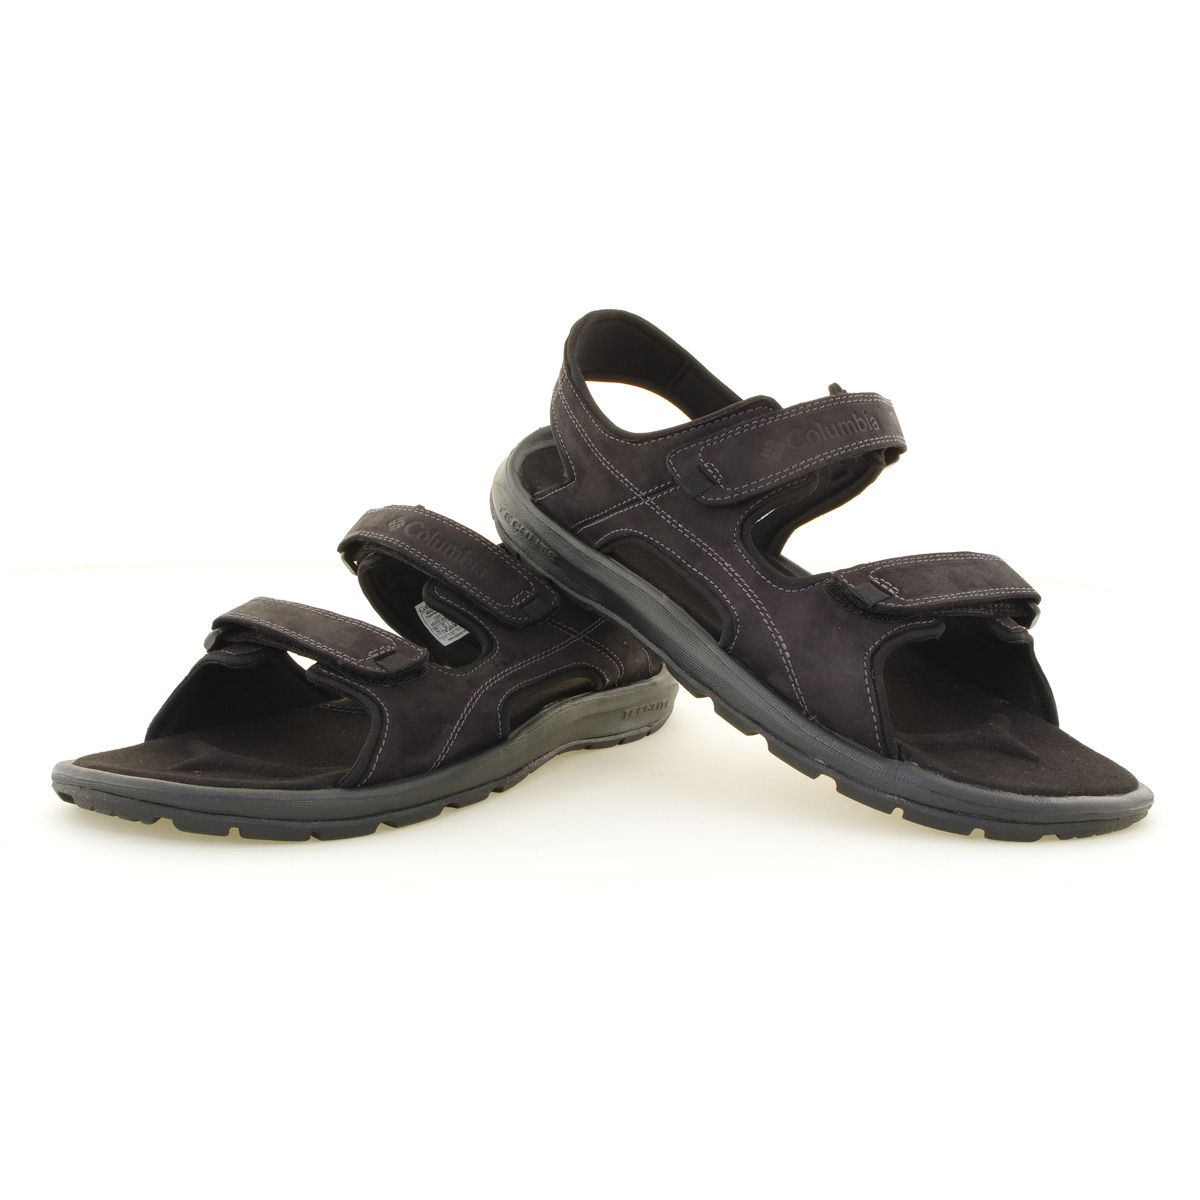 chaussures monterosso ii noir grande taille du 46 au 50. Black Bedroom Furniture Sets. Home Design Ideas